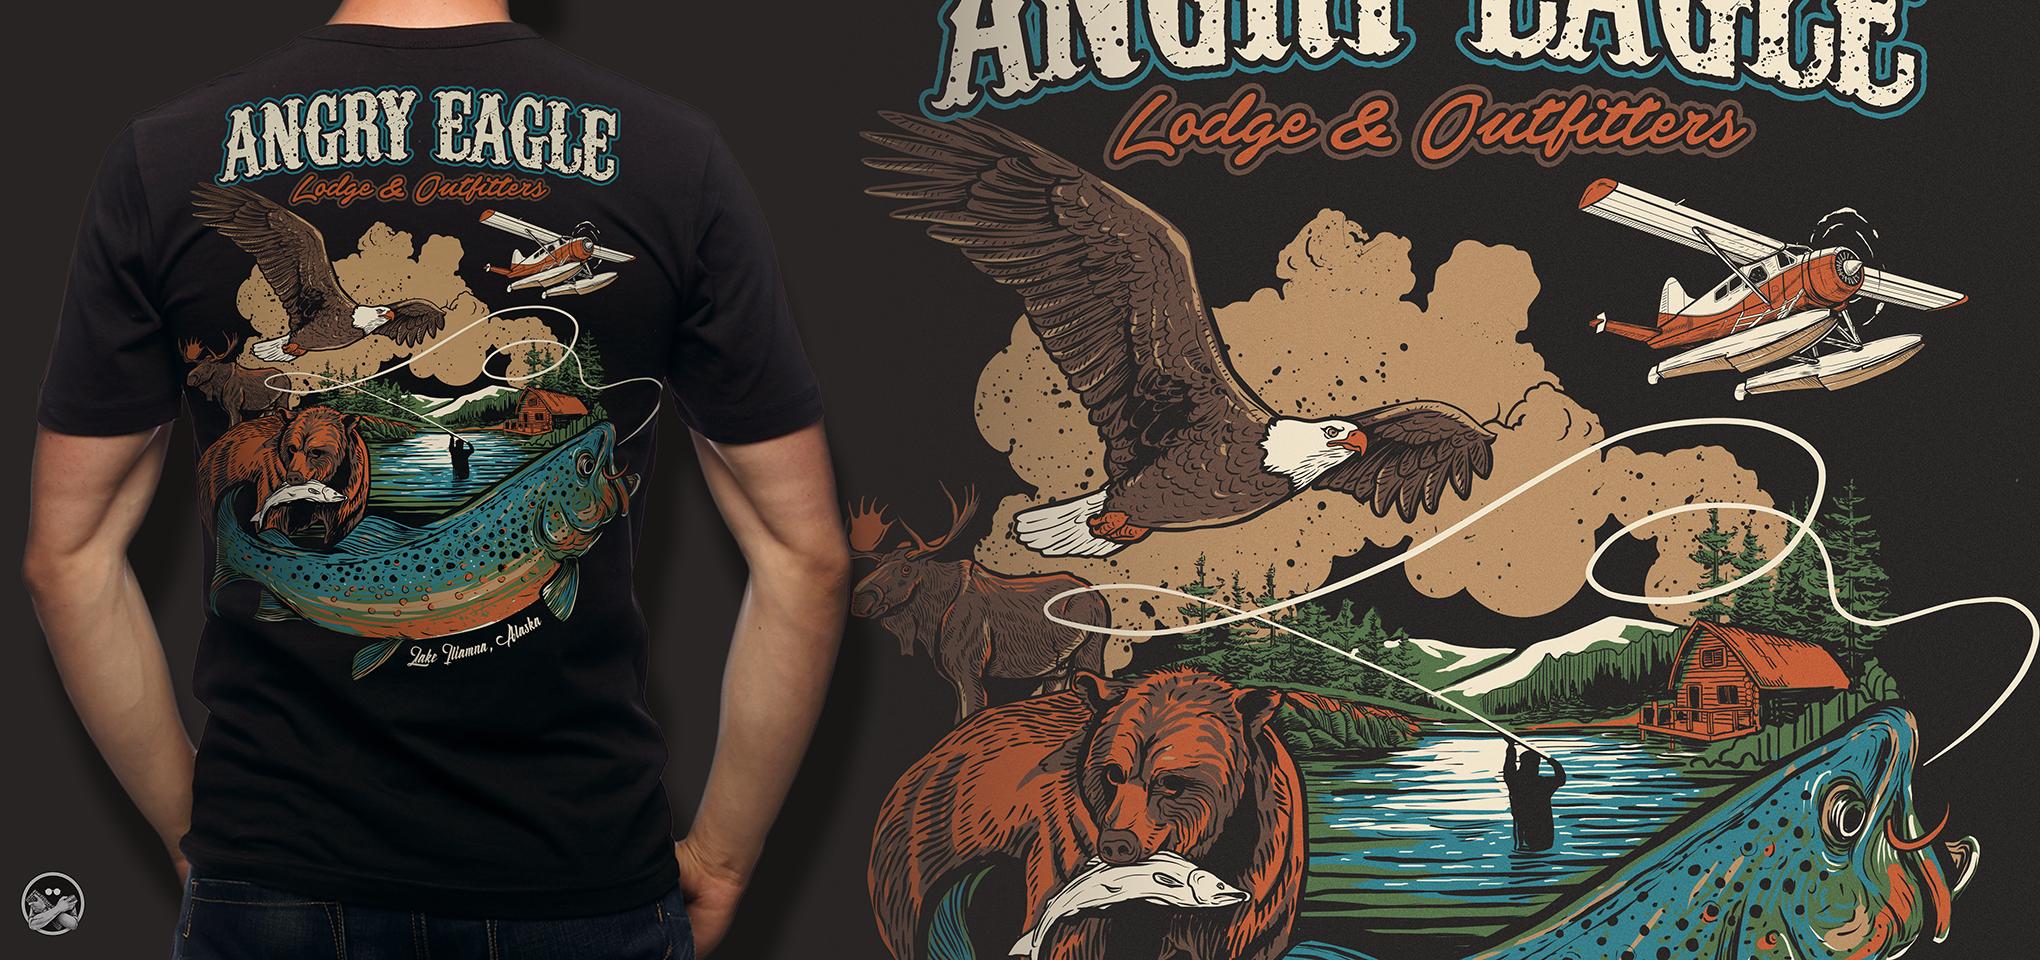 New T-Shirt for Angry Eagle Lodge & Outfitters, Lake Iliamna, Alaska